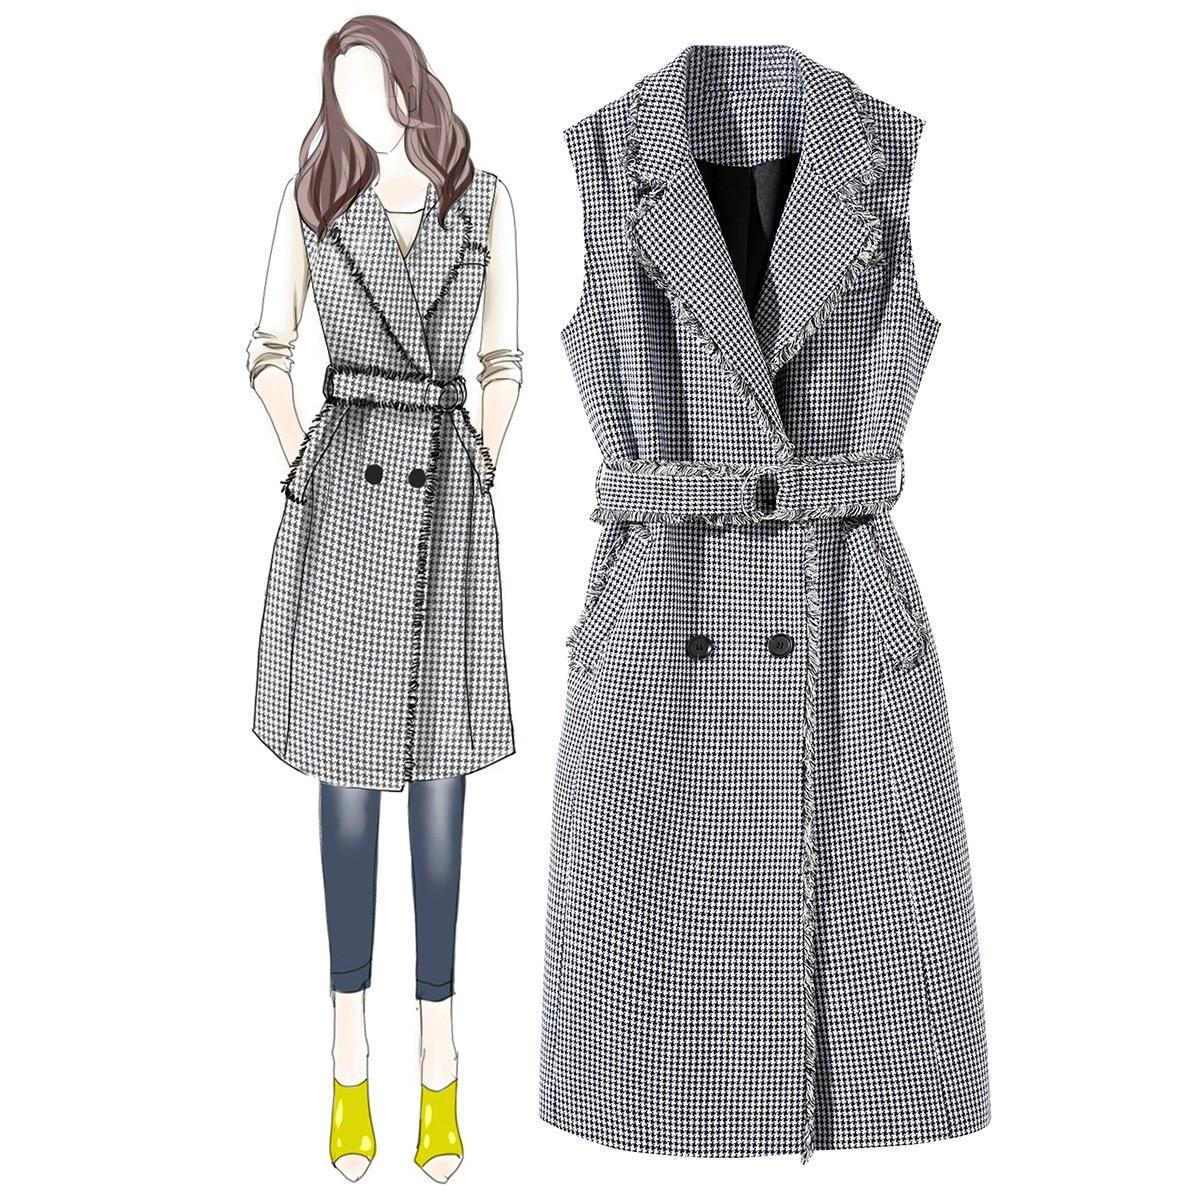 Autumn Spring Women Office Work Dress Vintage Slim Vest Plaid Female Fashion Sleeveless Tassel